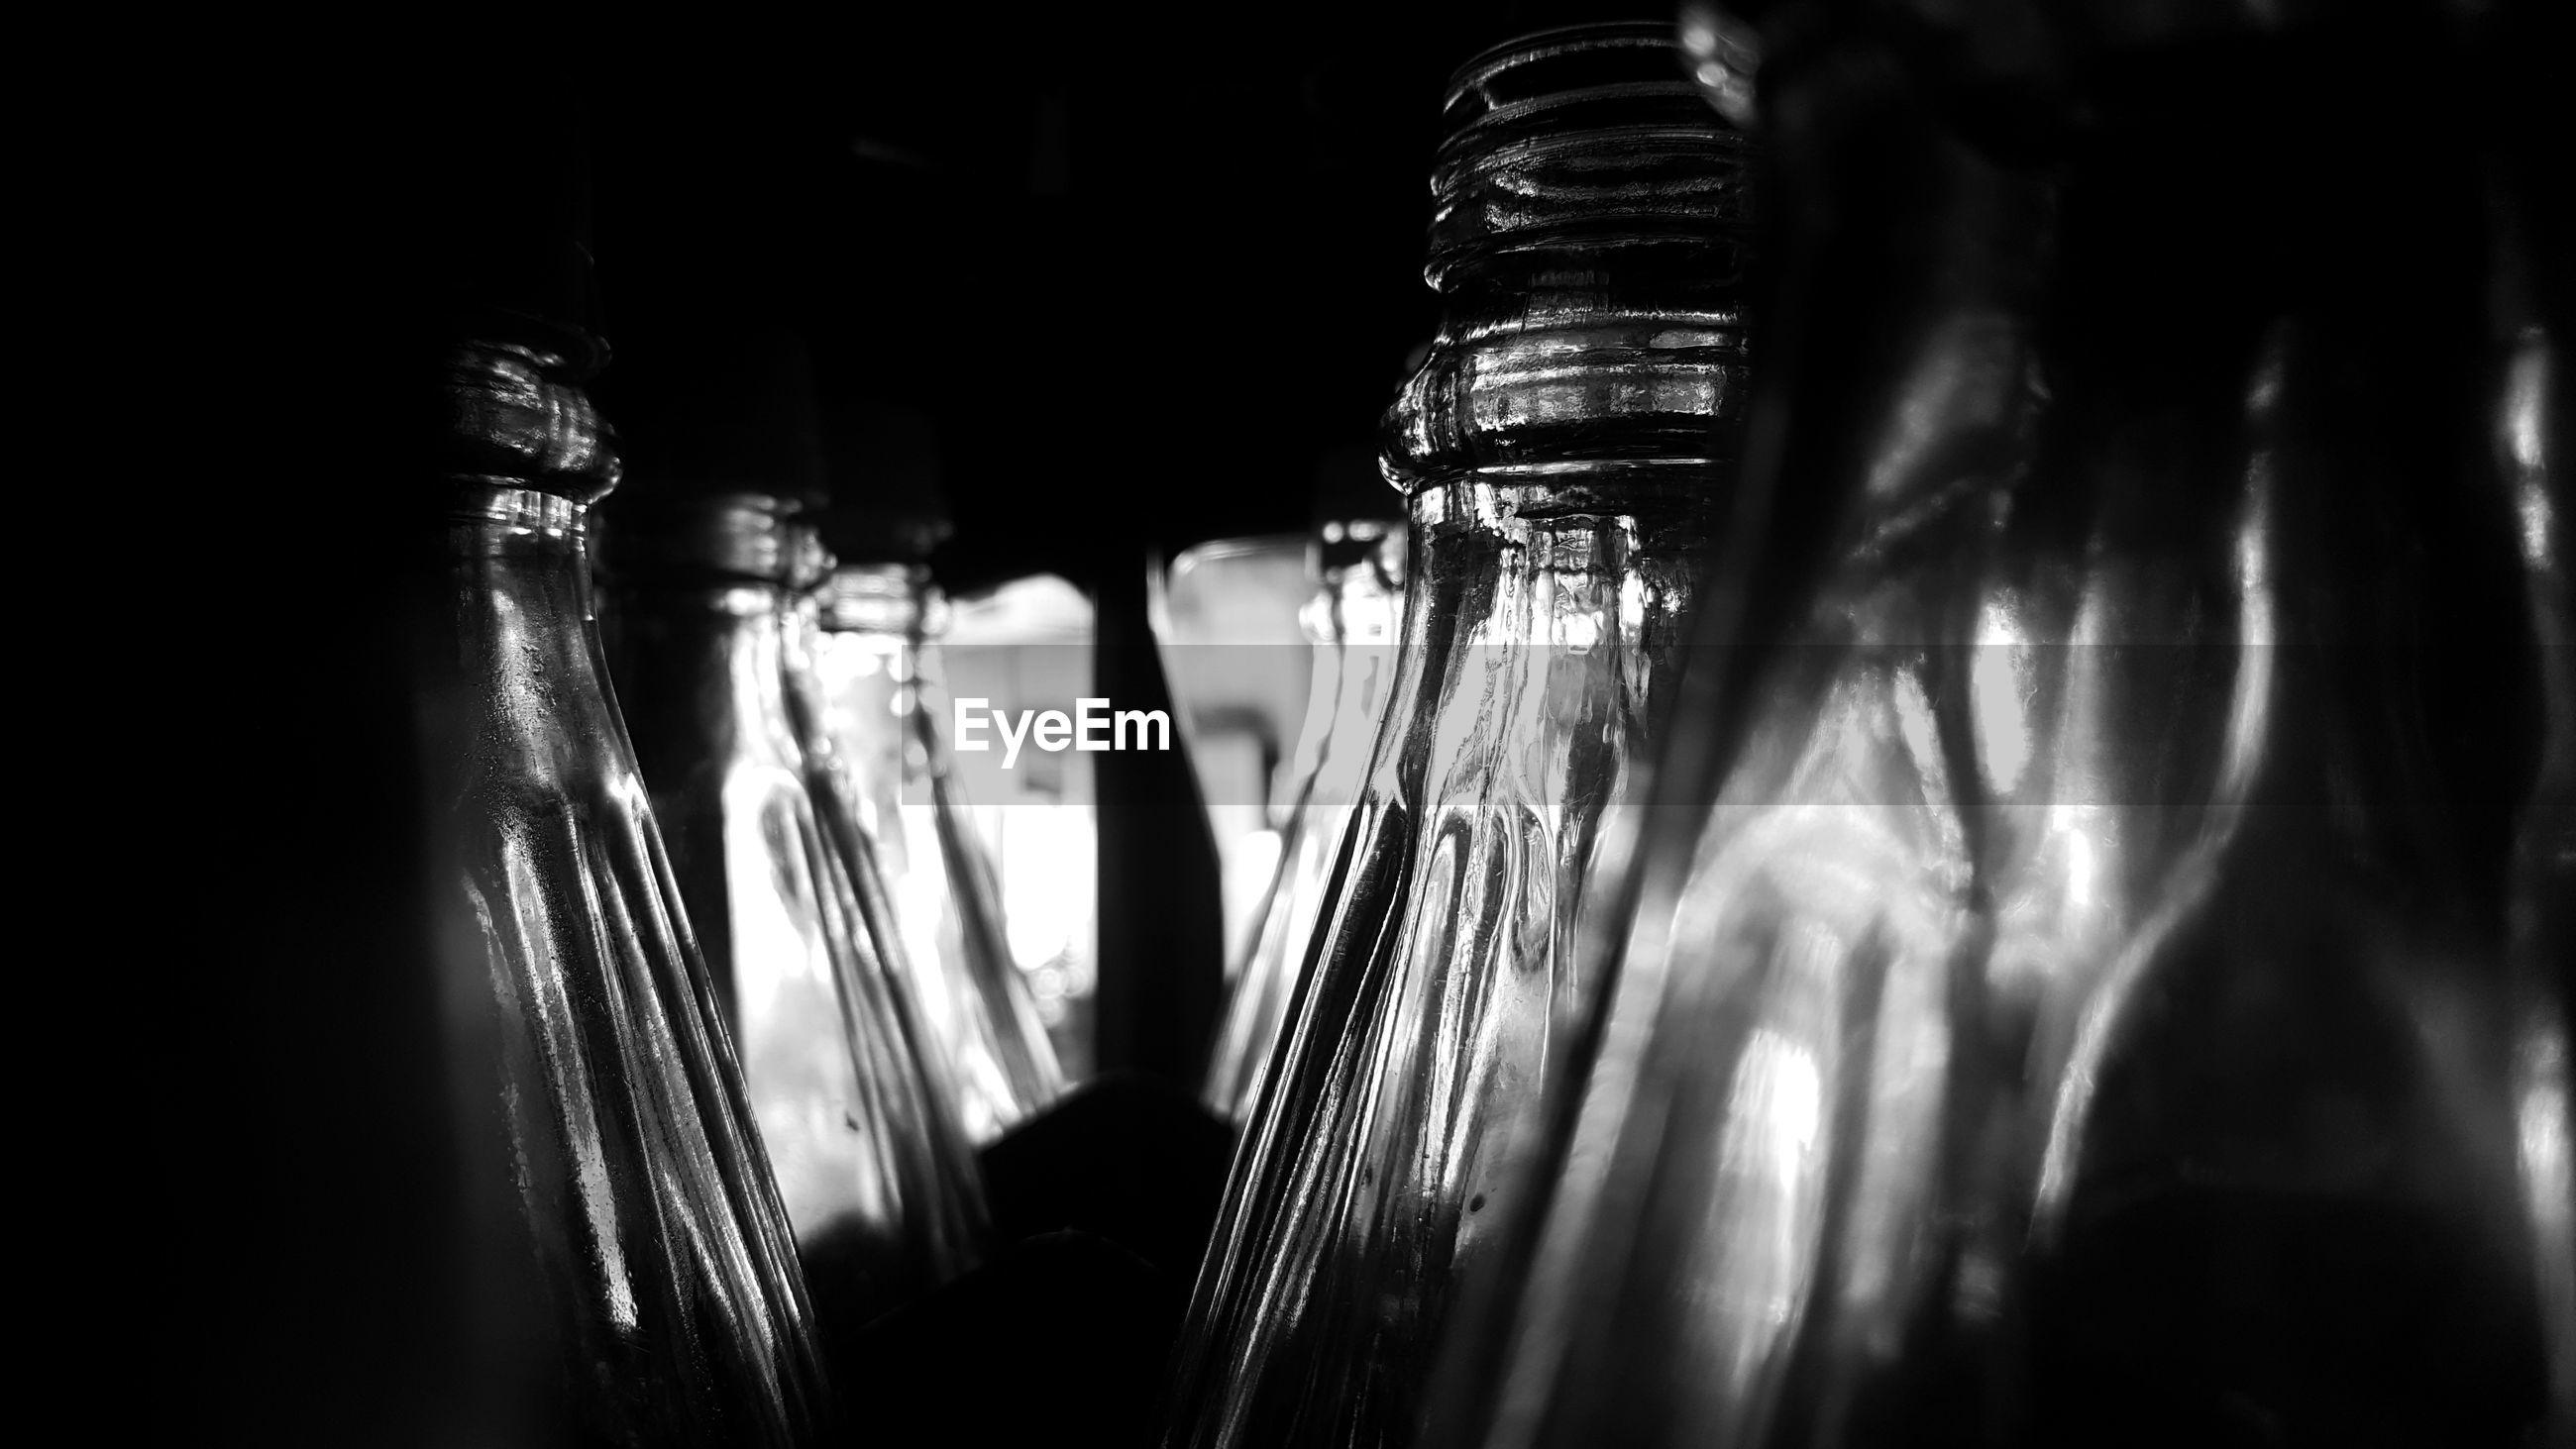 Close-up of bottles in darkroom